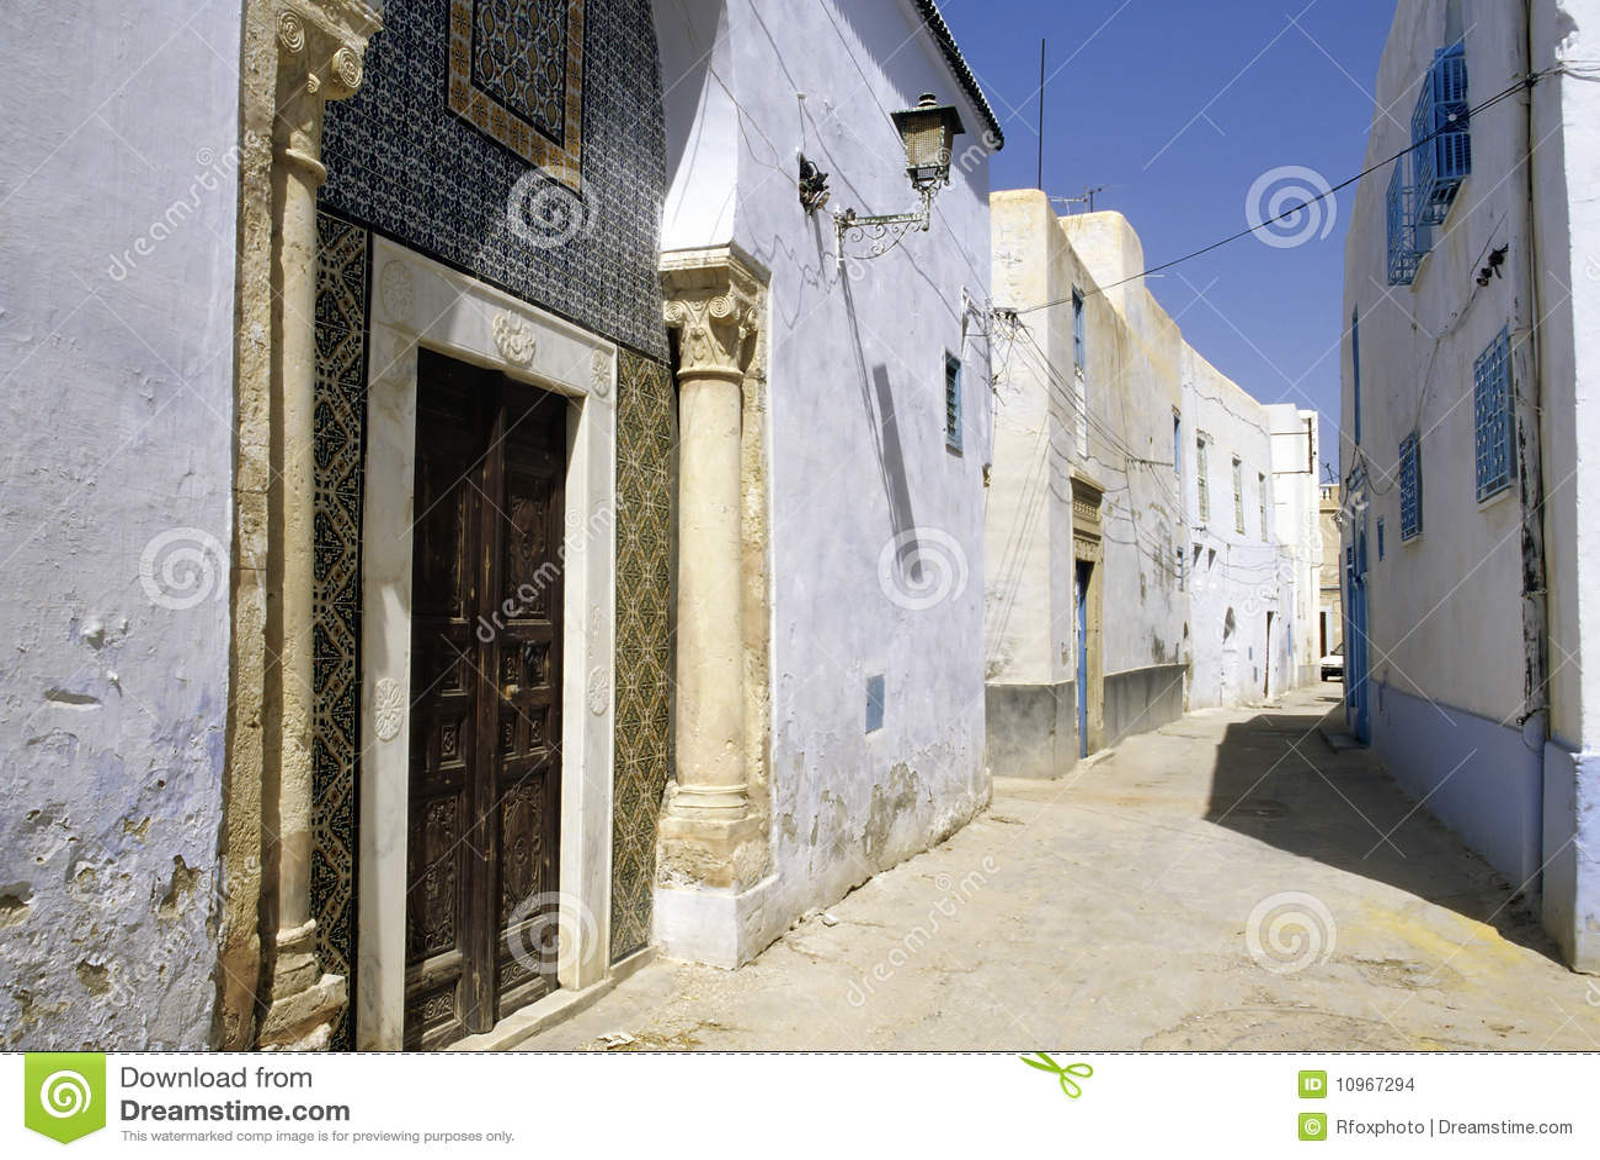 Kairouan Tunisia  city pictures gallery : ... of homes in the UNESCO World Heritage medina of Kairouan Tunisia